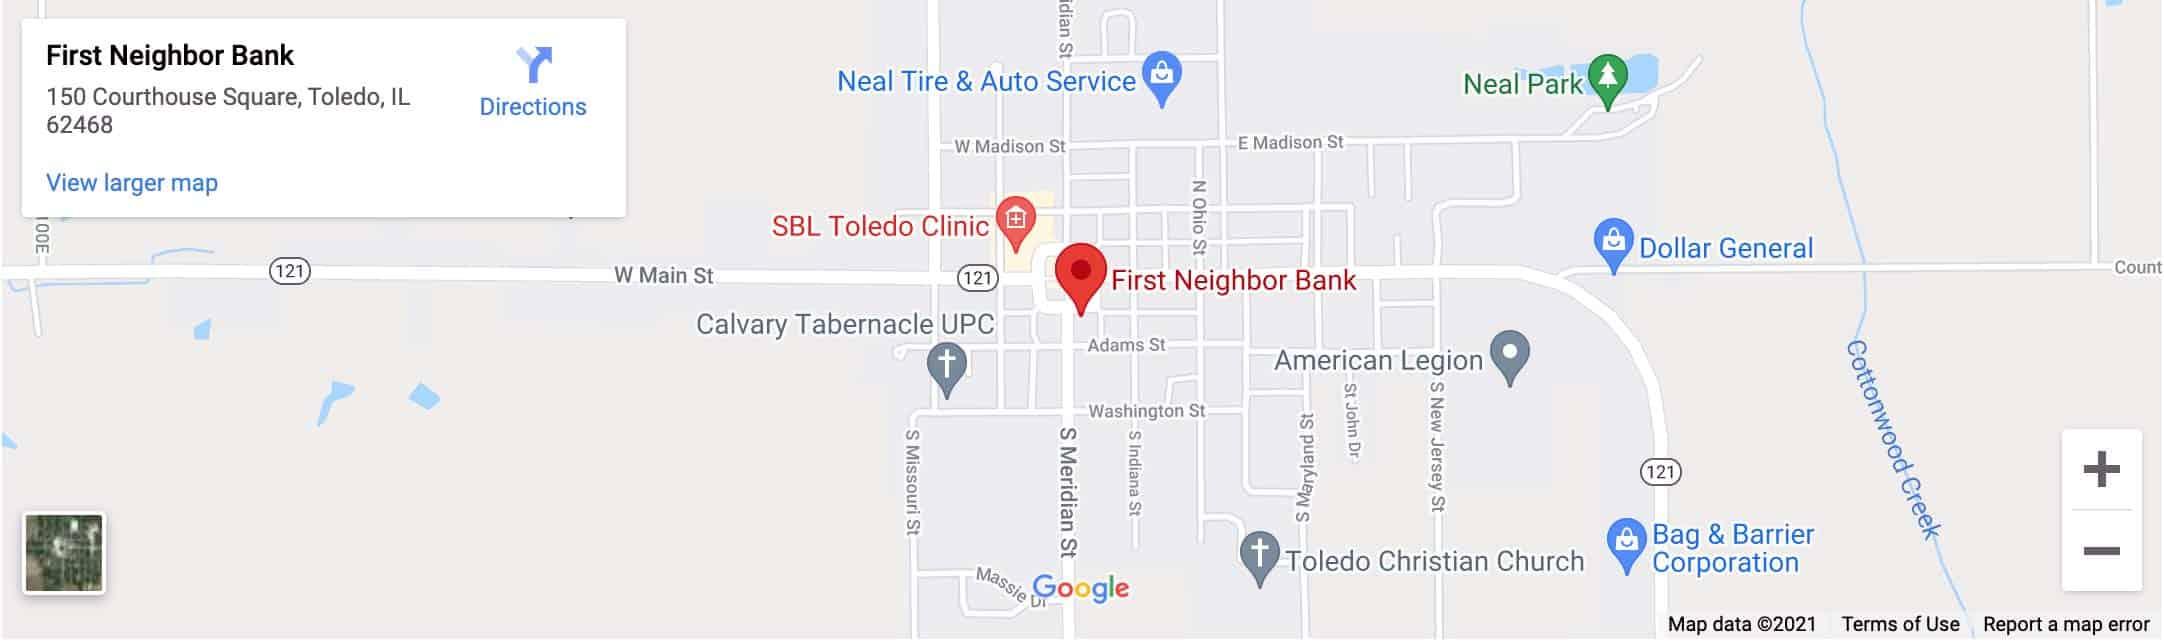 FNB Toledo Branch Google Map Image